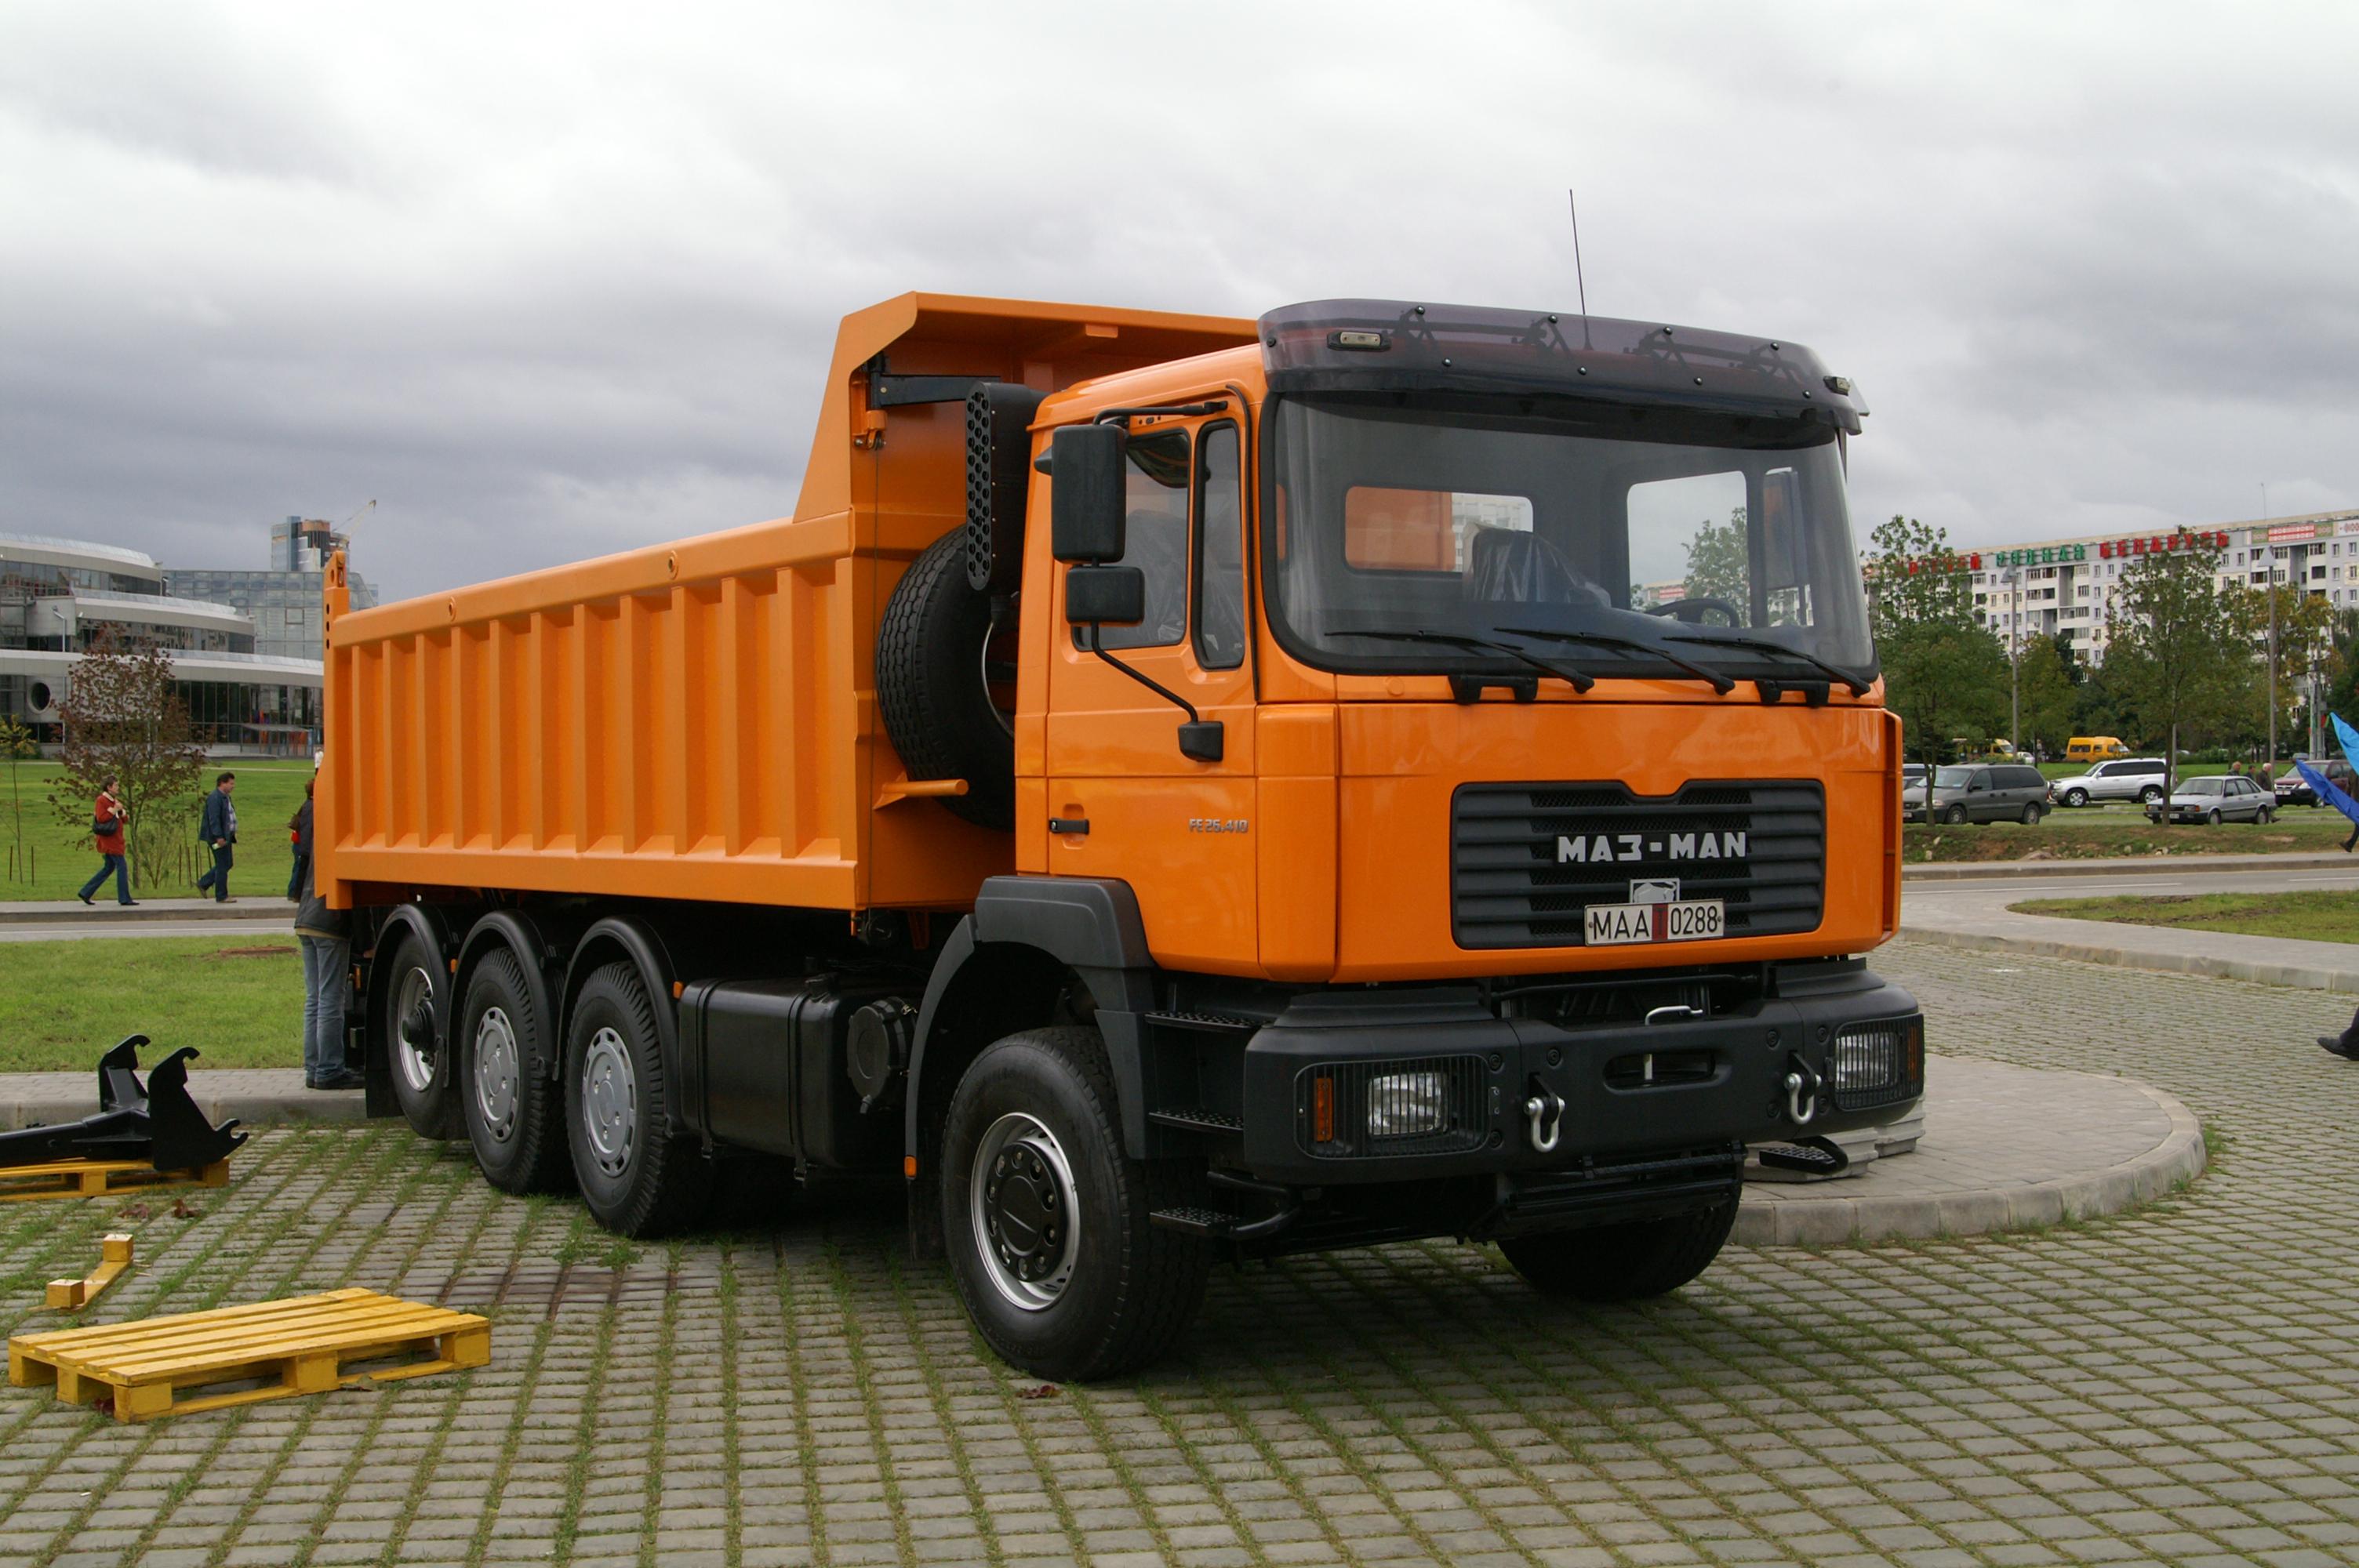 [Resim: MAZ-MAN_truck.JPG]